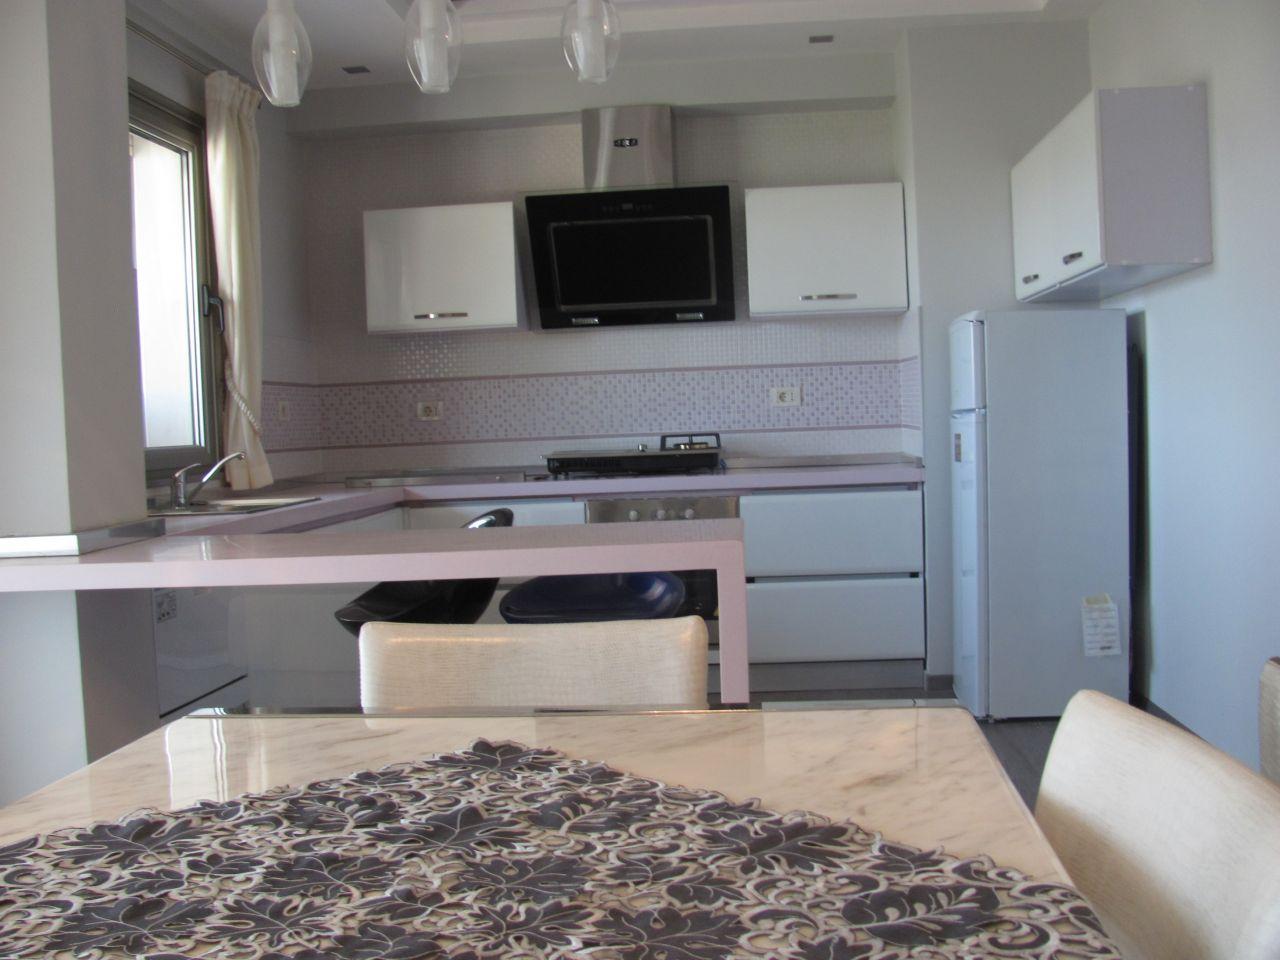 Apartments for Rent in Tirana. Near Park and Lake in Tirana